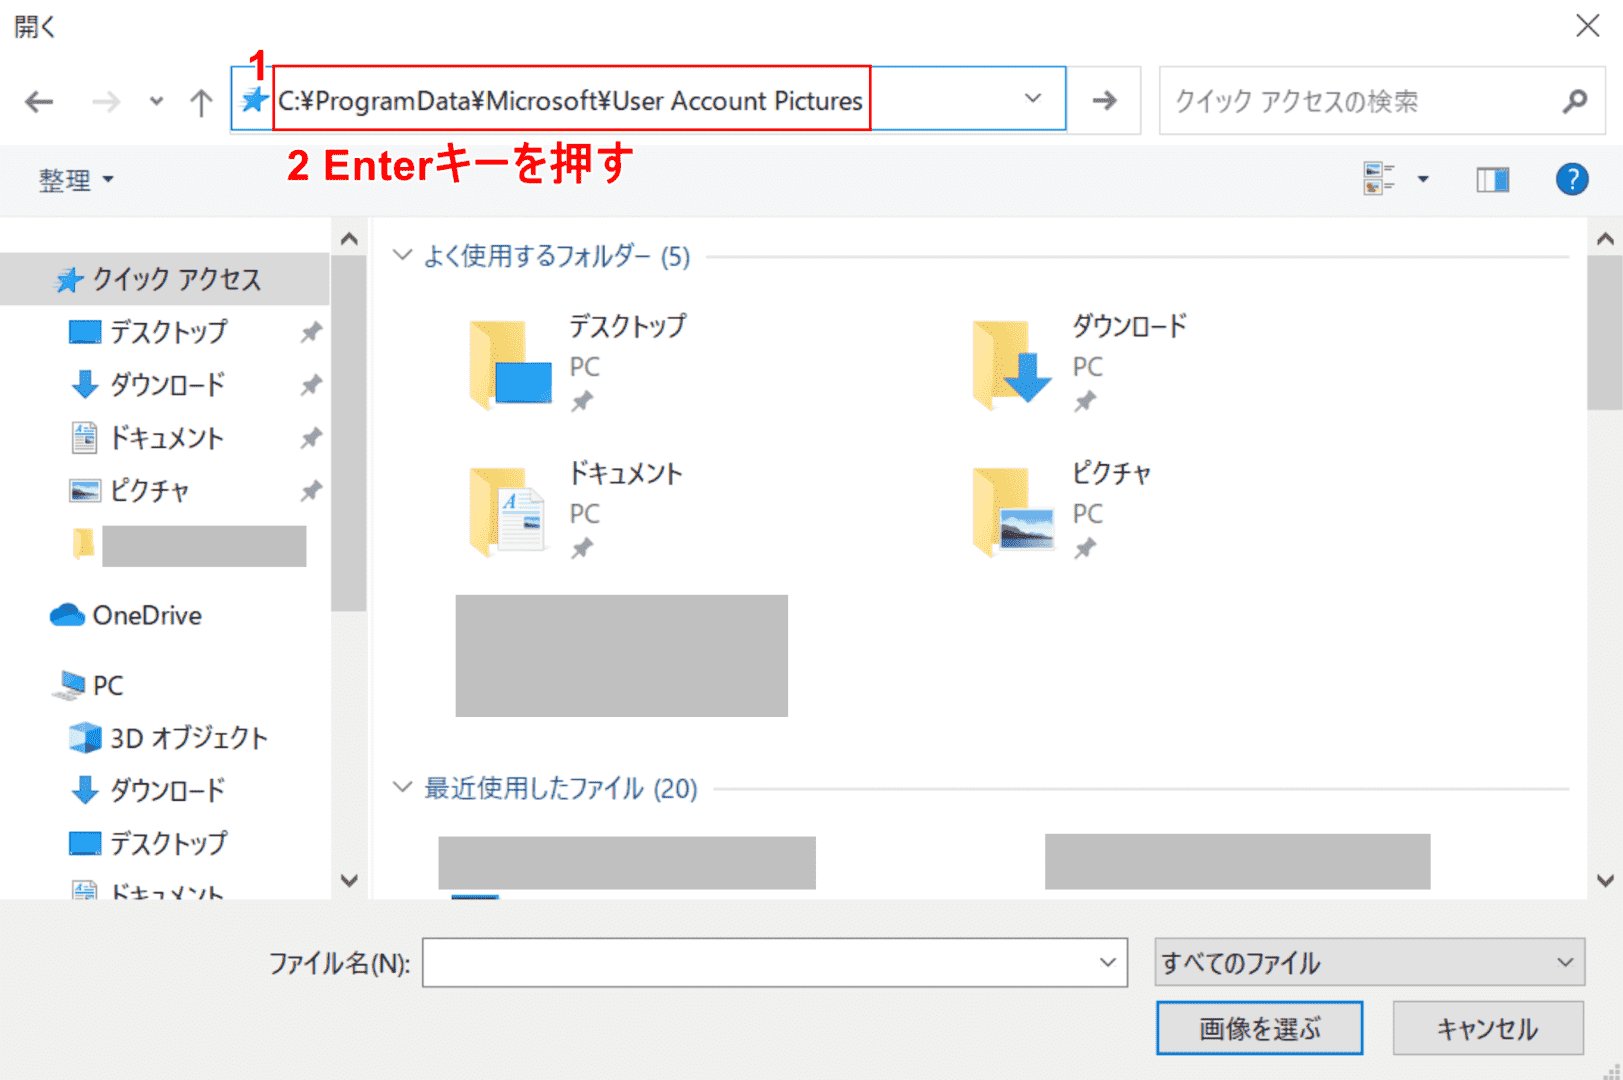 C:ProgramDataMicrosoftUser Account Pictures